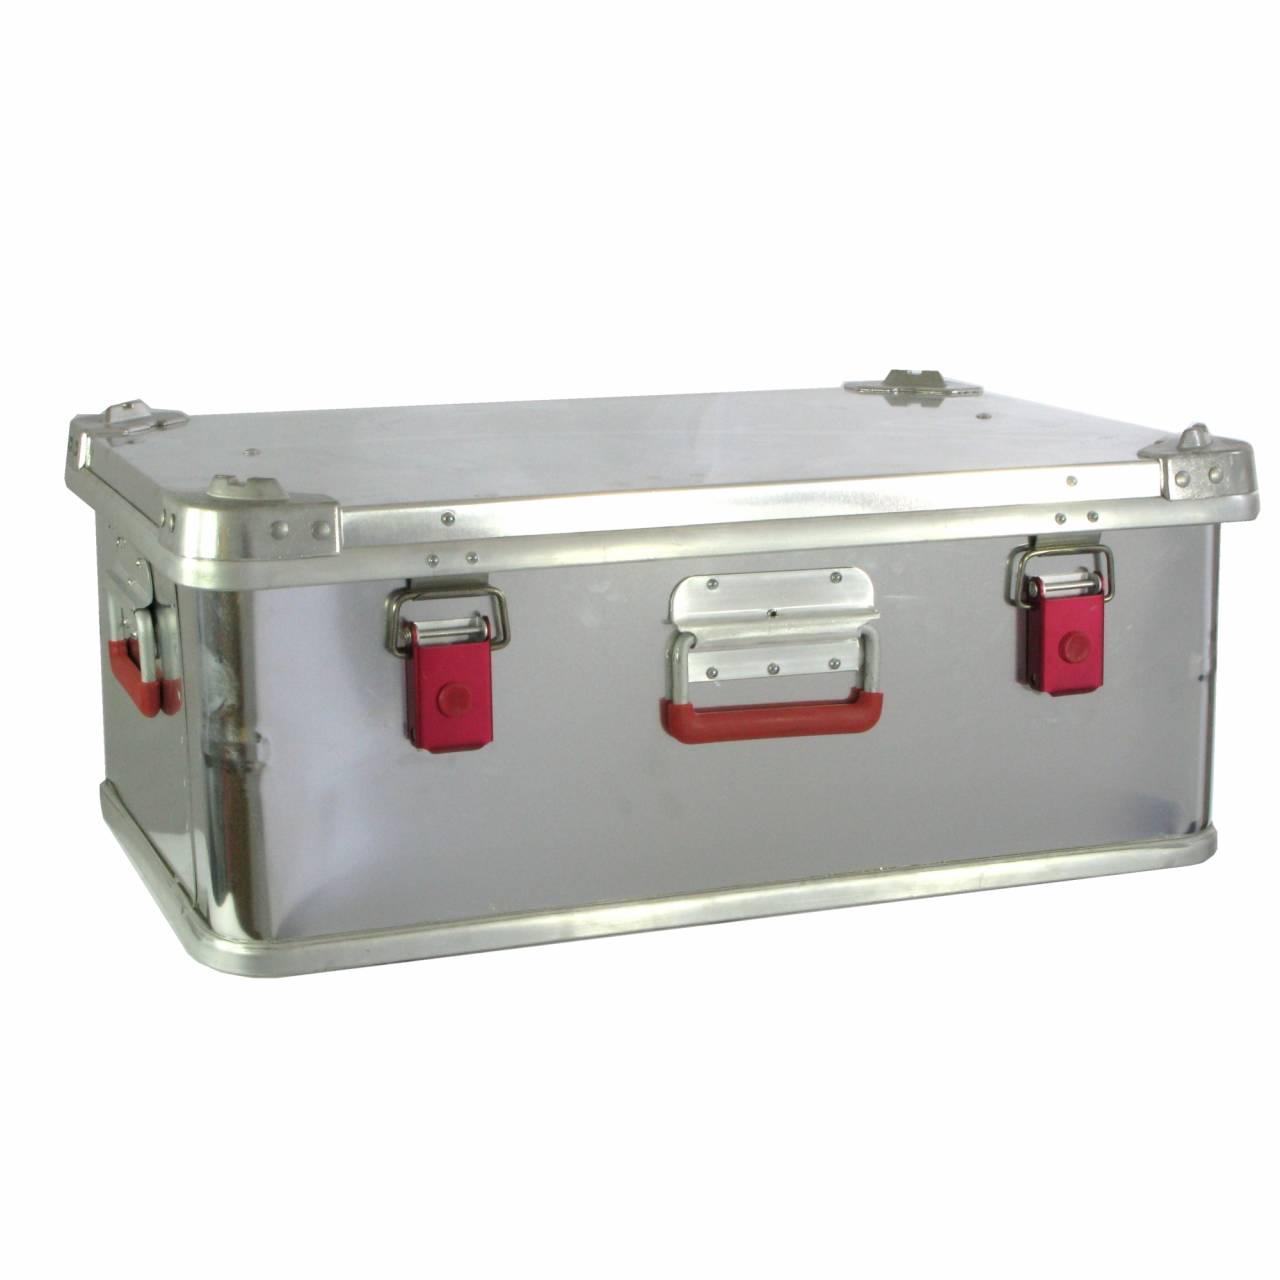 Alu-Werkzeugbox Gr.4, 783 x 581 x 400 mm